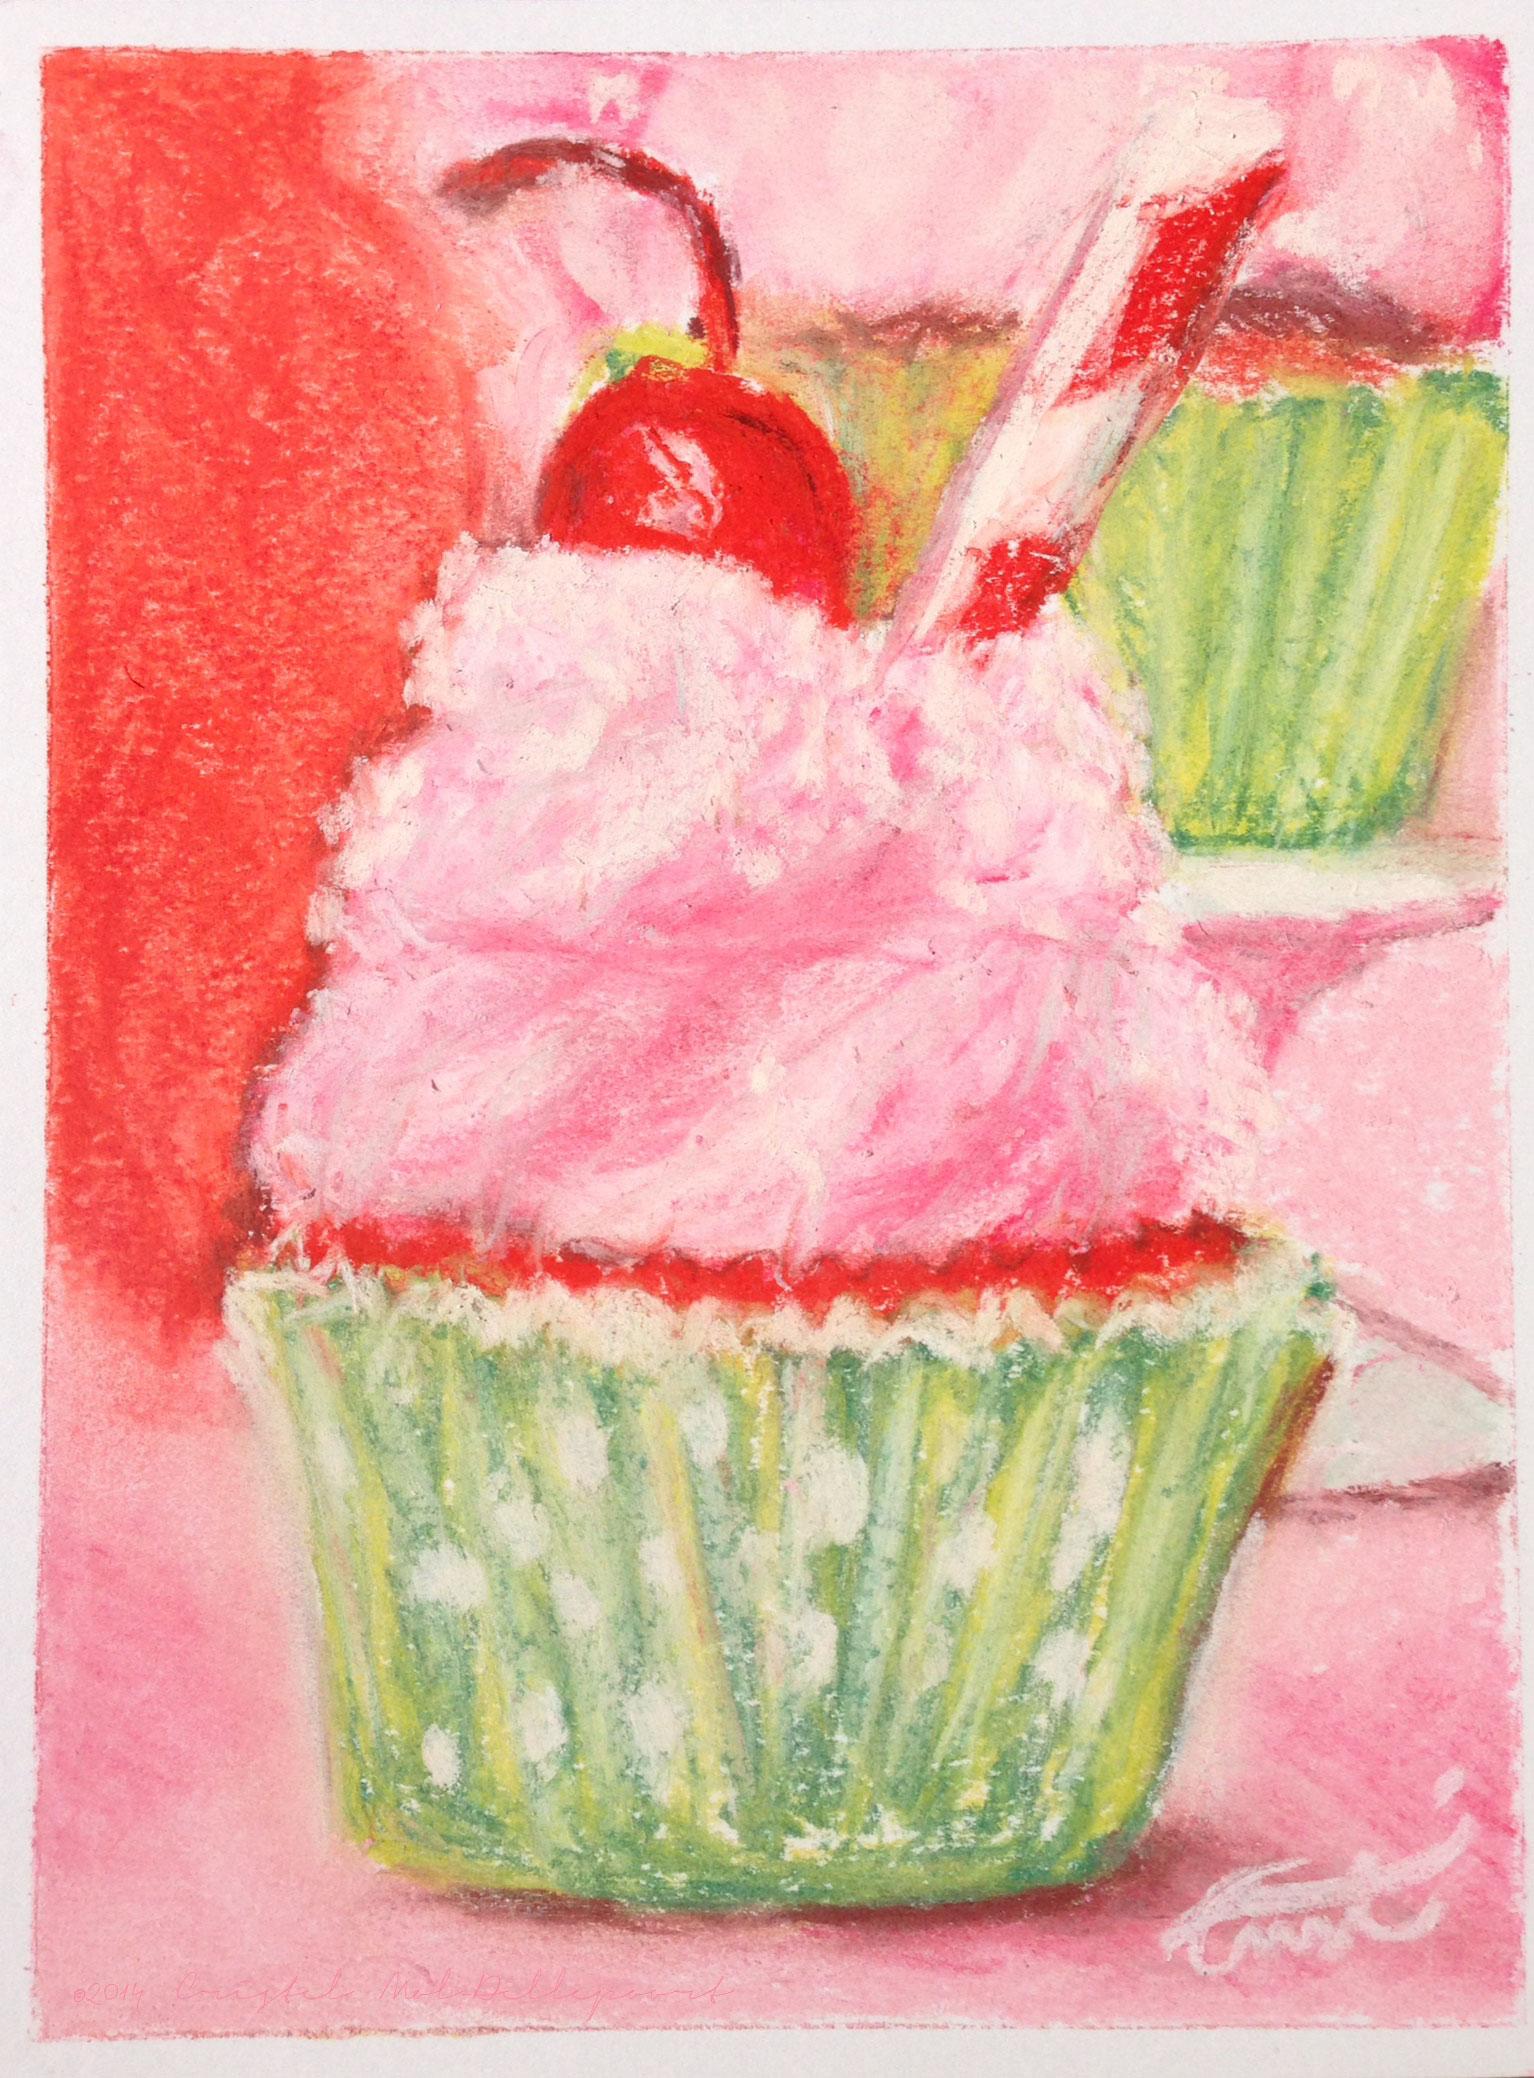 Cherry Limeade Cupcake | Cristel Mol-Dellepoort – Pastel Artist